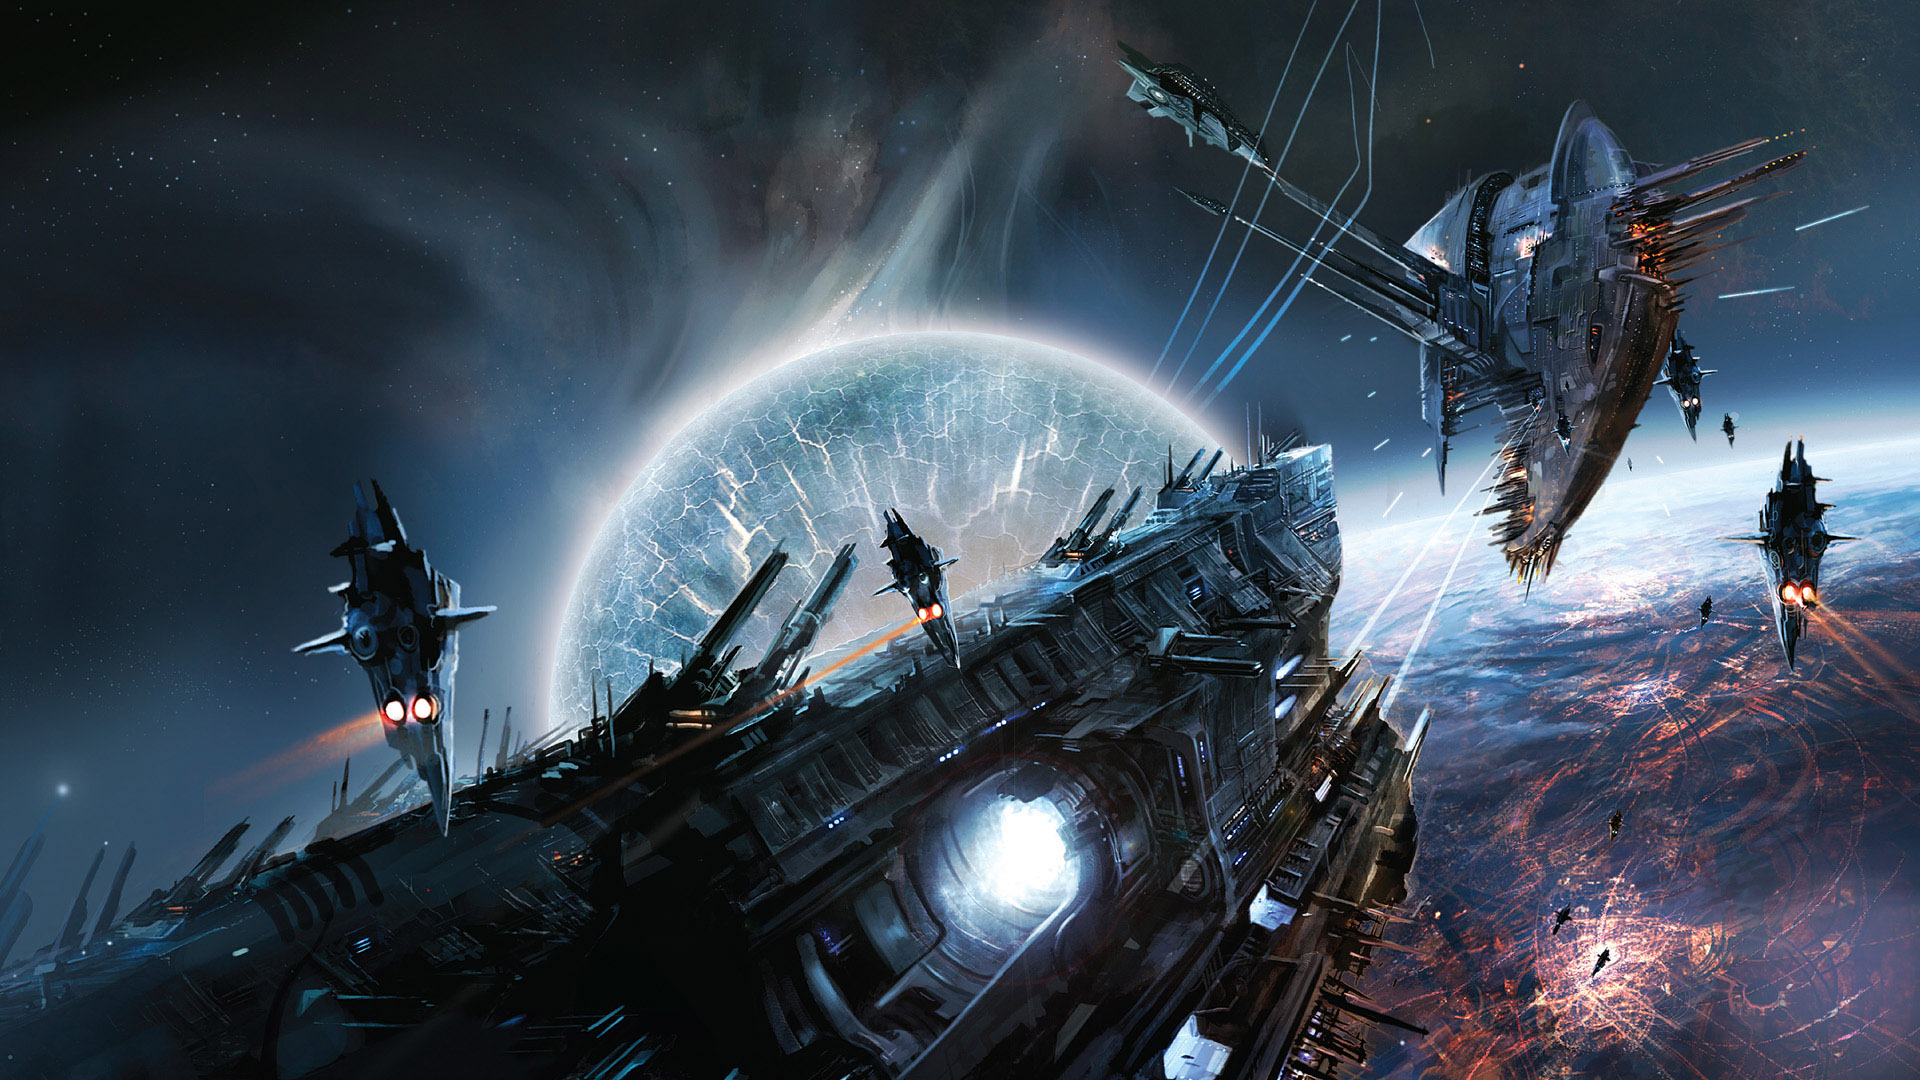 HD Wallpapers Space War Game Scene